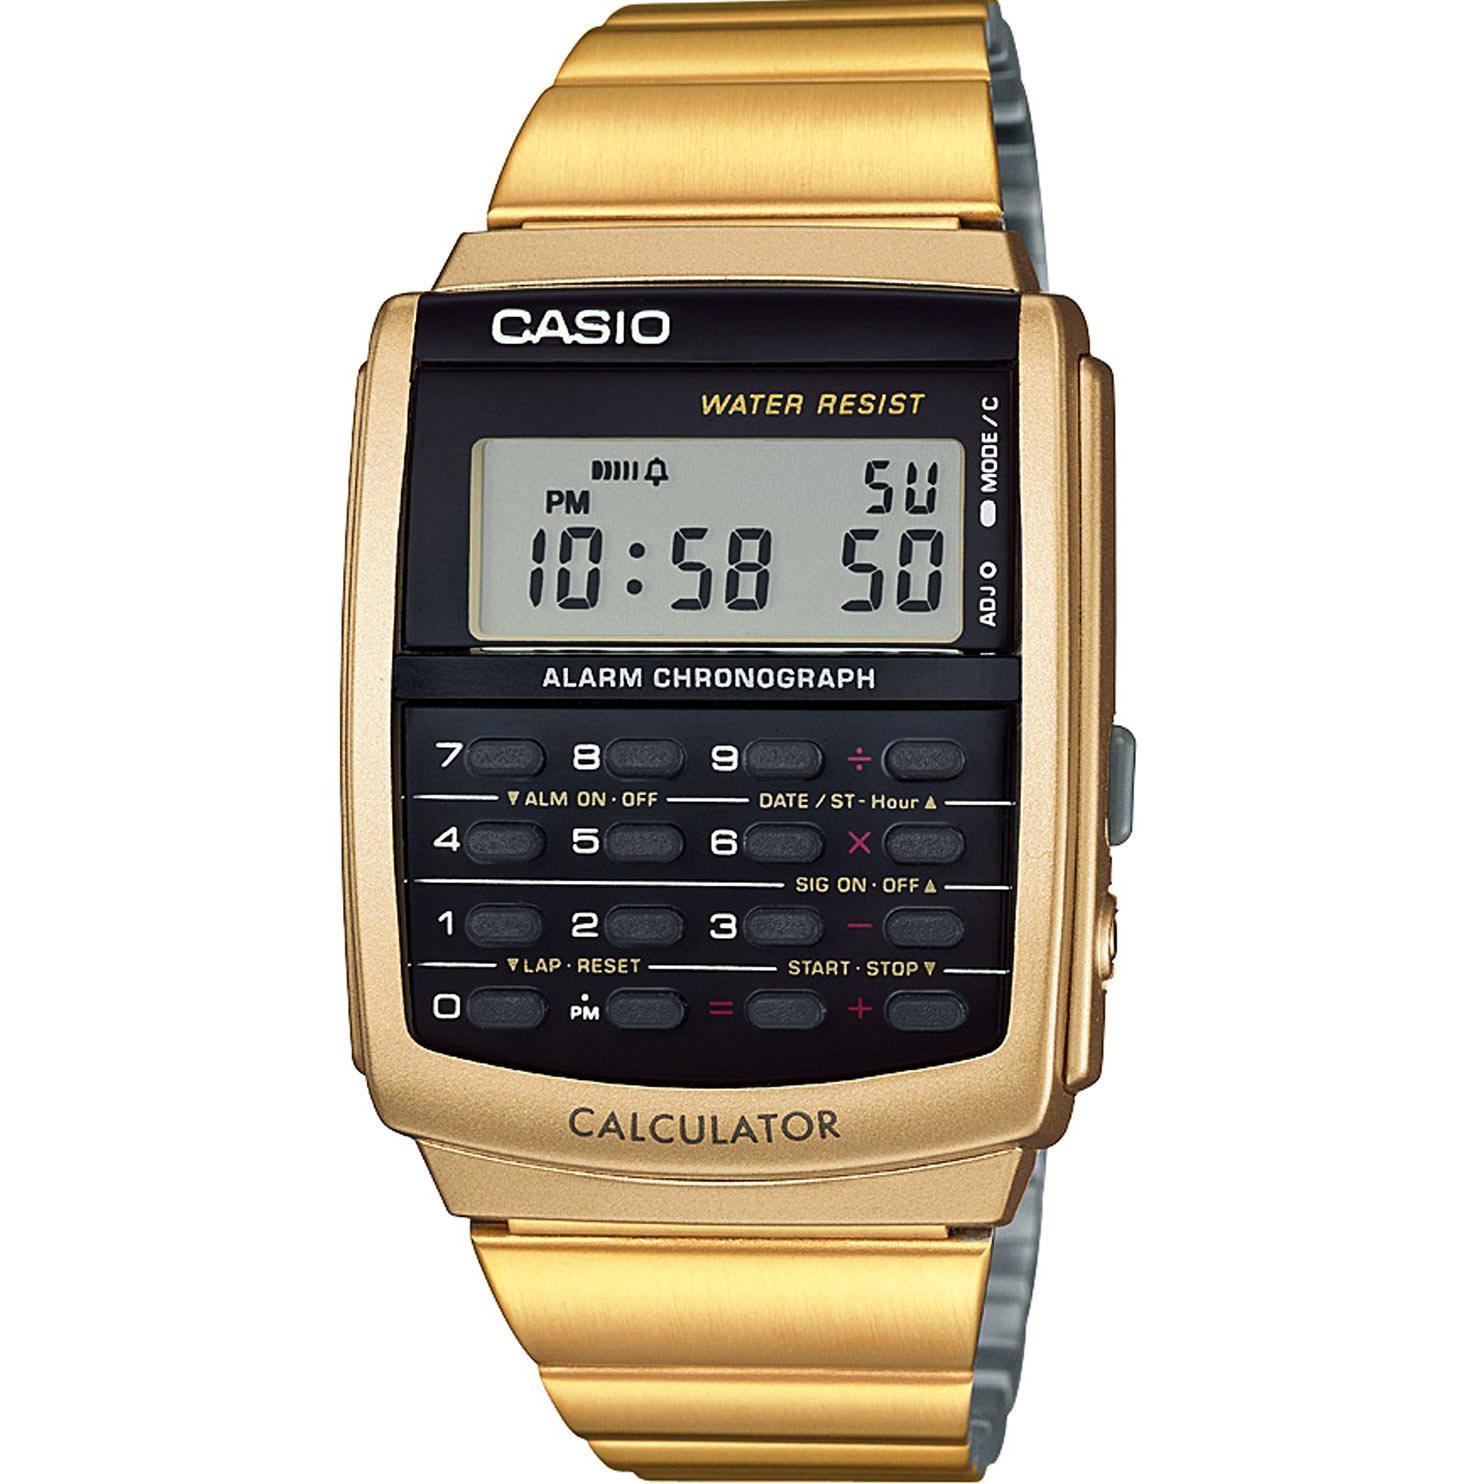 Casio DATA BANK นาฬิกาข้อมือเครื่องคิดเลข สีดำ/สีทอง สายสแตนเลส รุ่น CA-506 meQ0